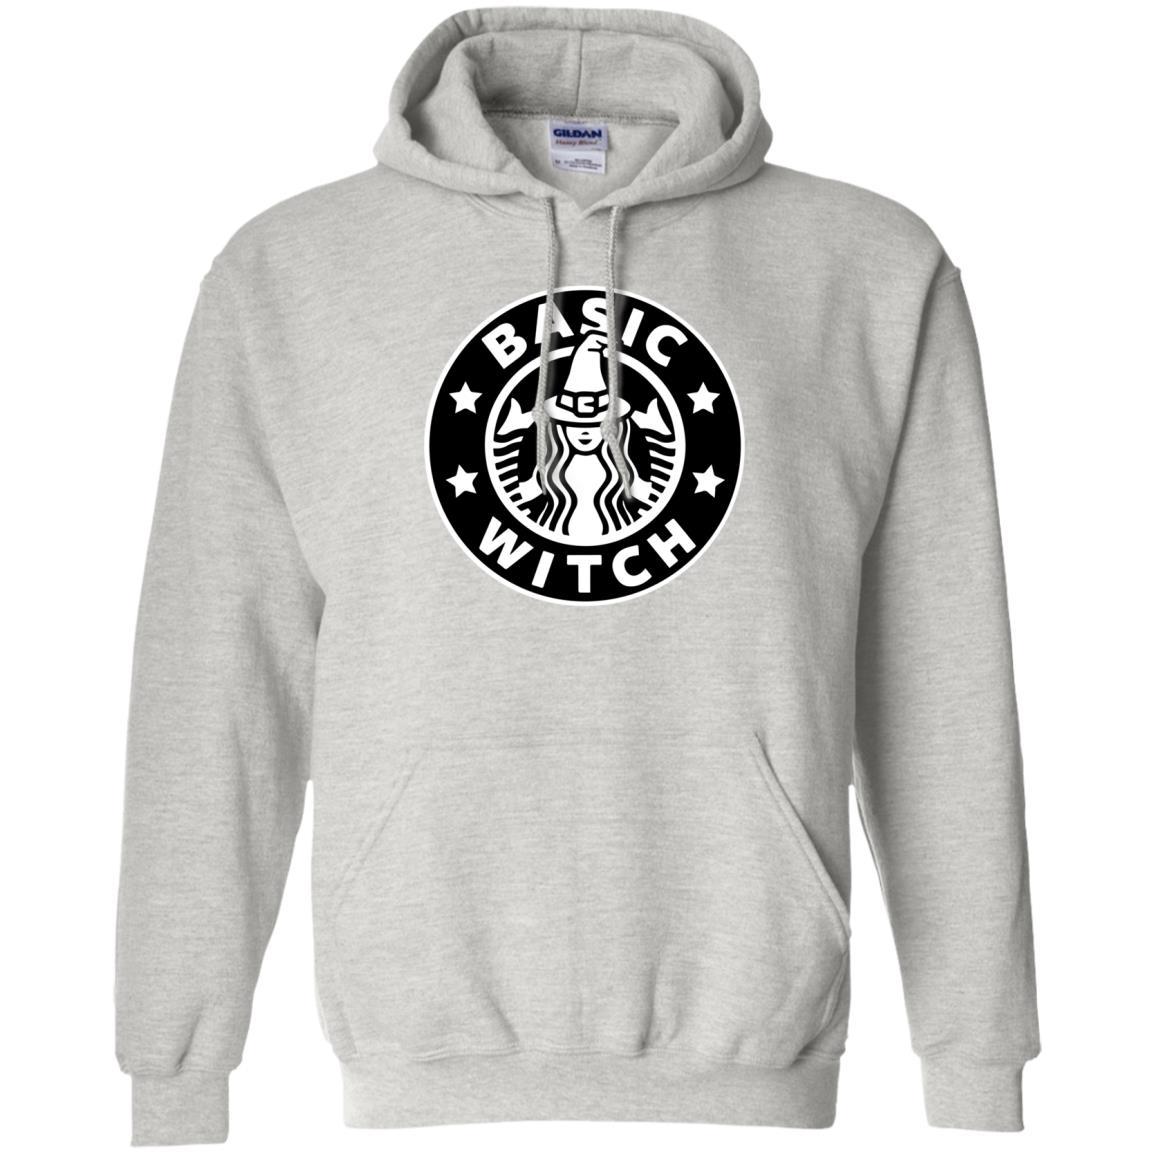 image 1018 - Basic Witch Shirt, Halloween Starbuck parody